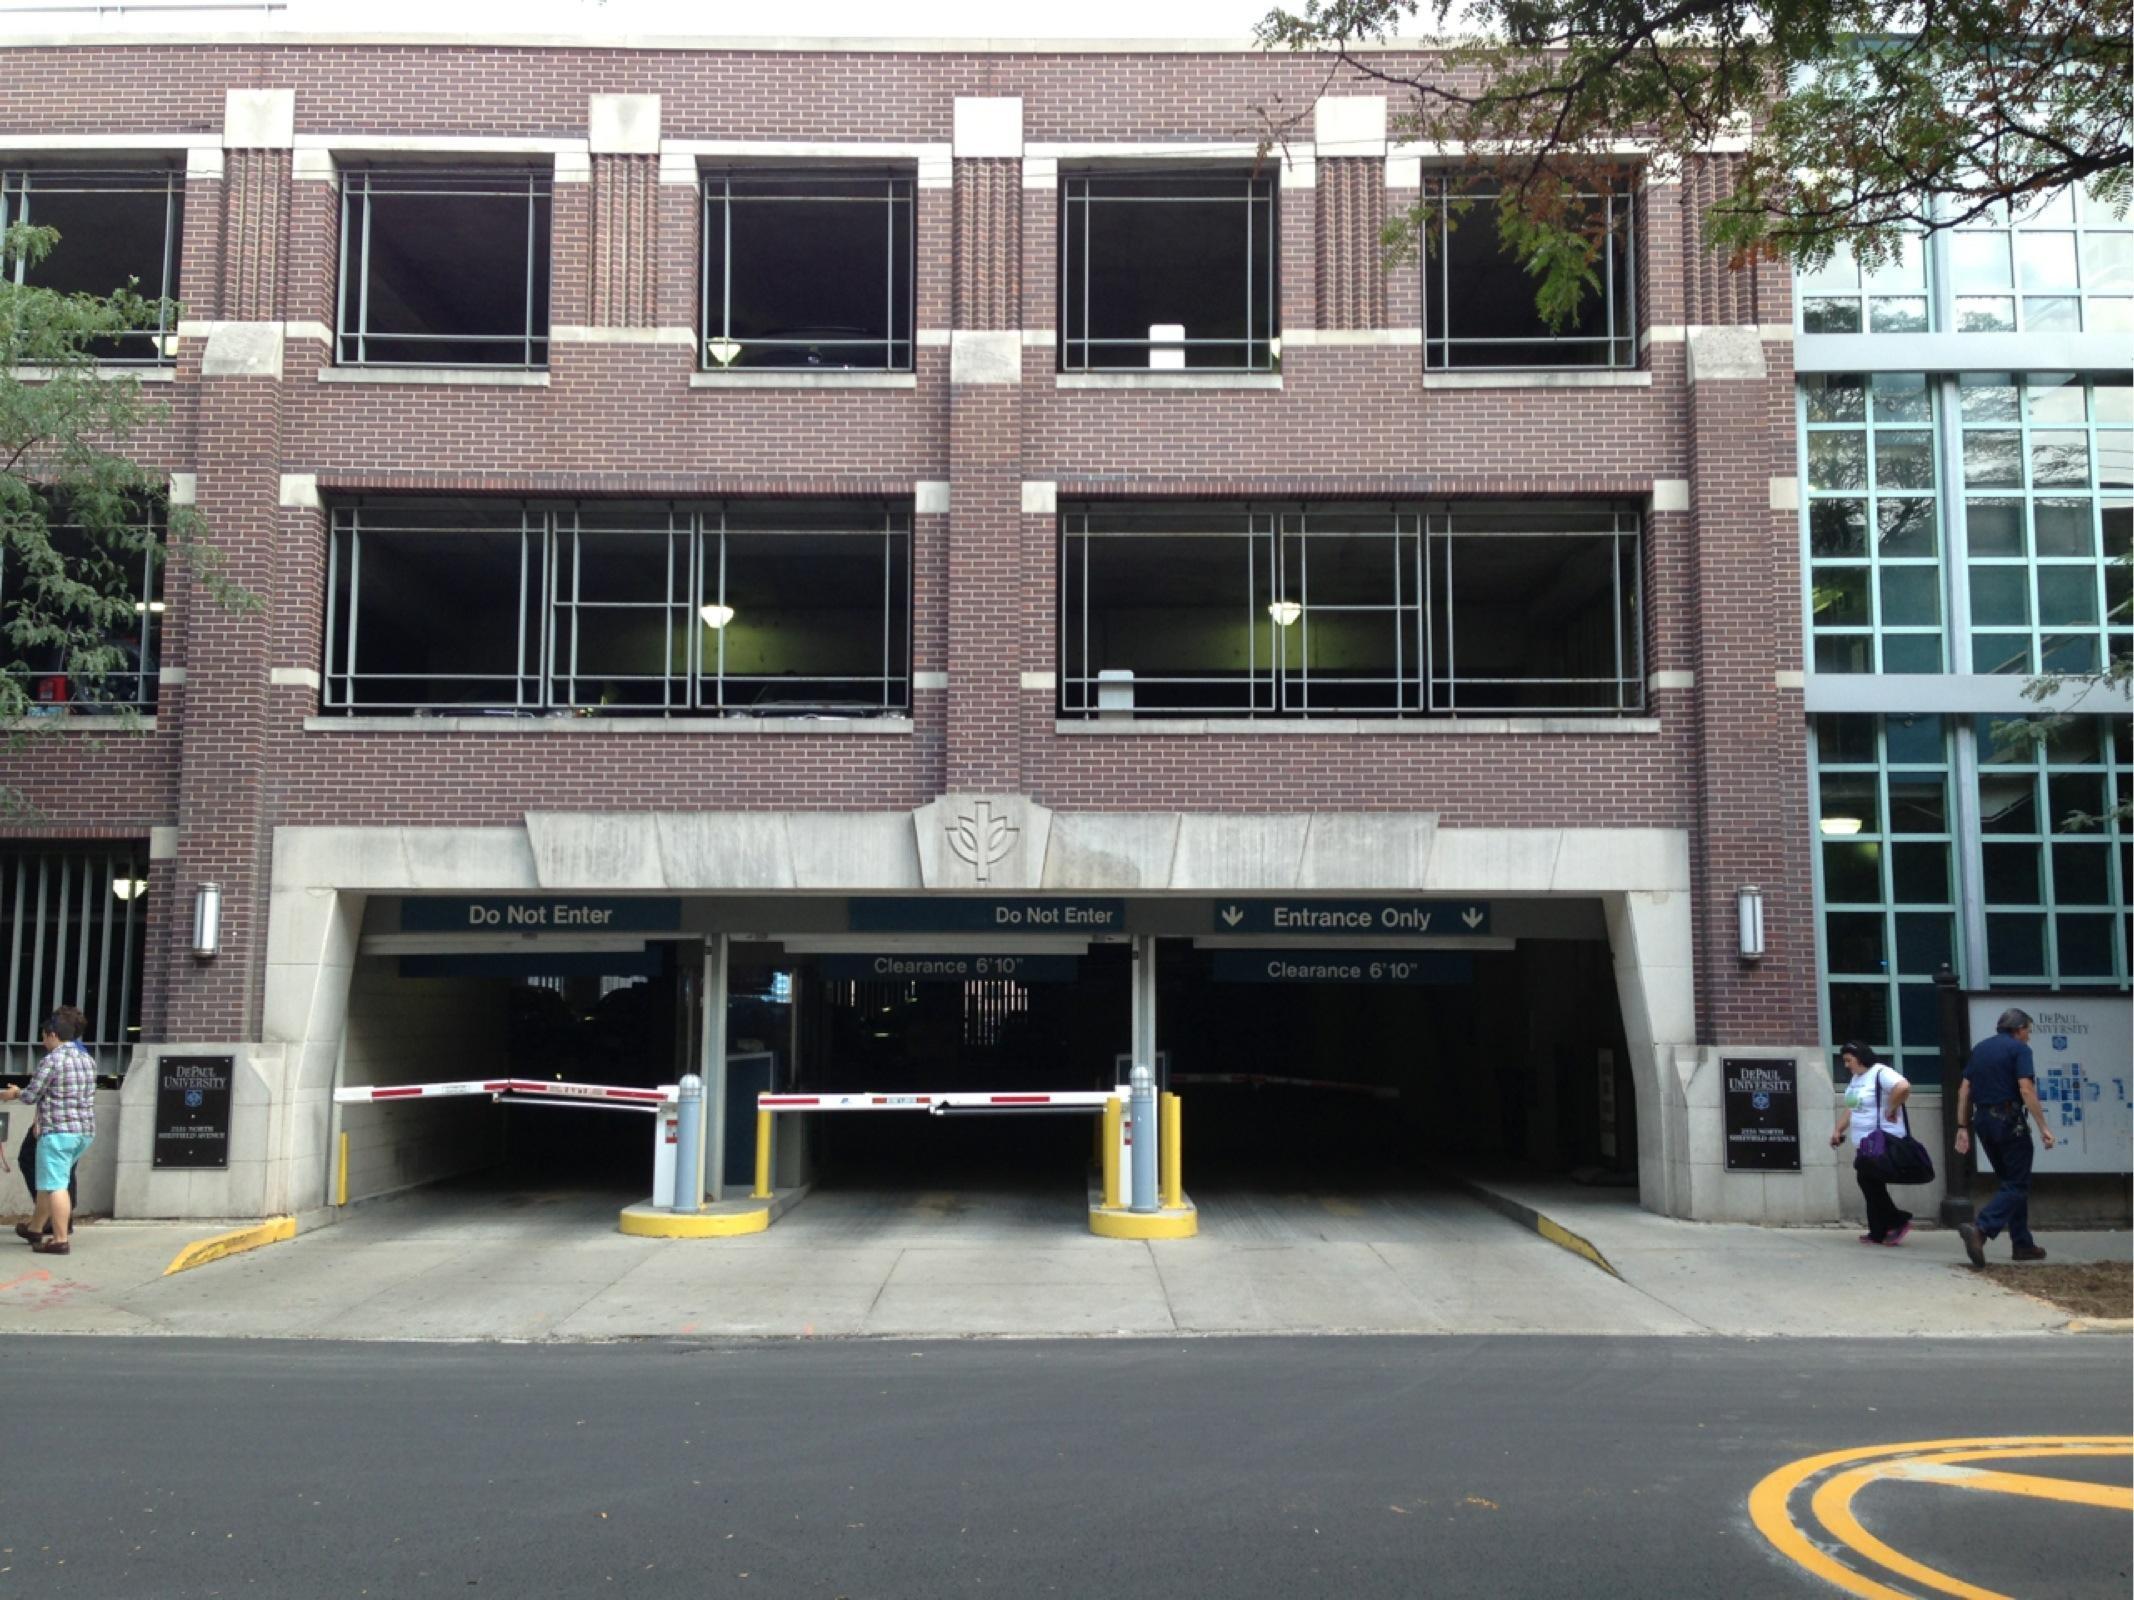 2331 n sheffield ave garage parking in chicago parkme - Parking garages near madison square garden ...